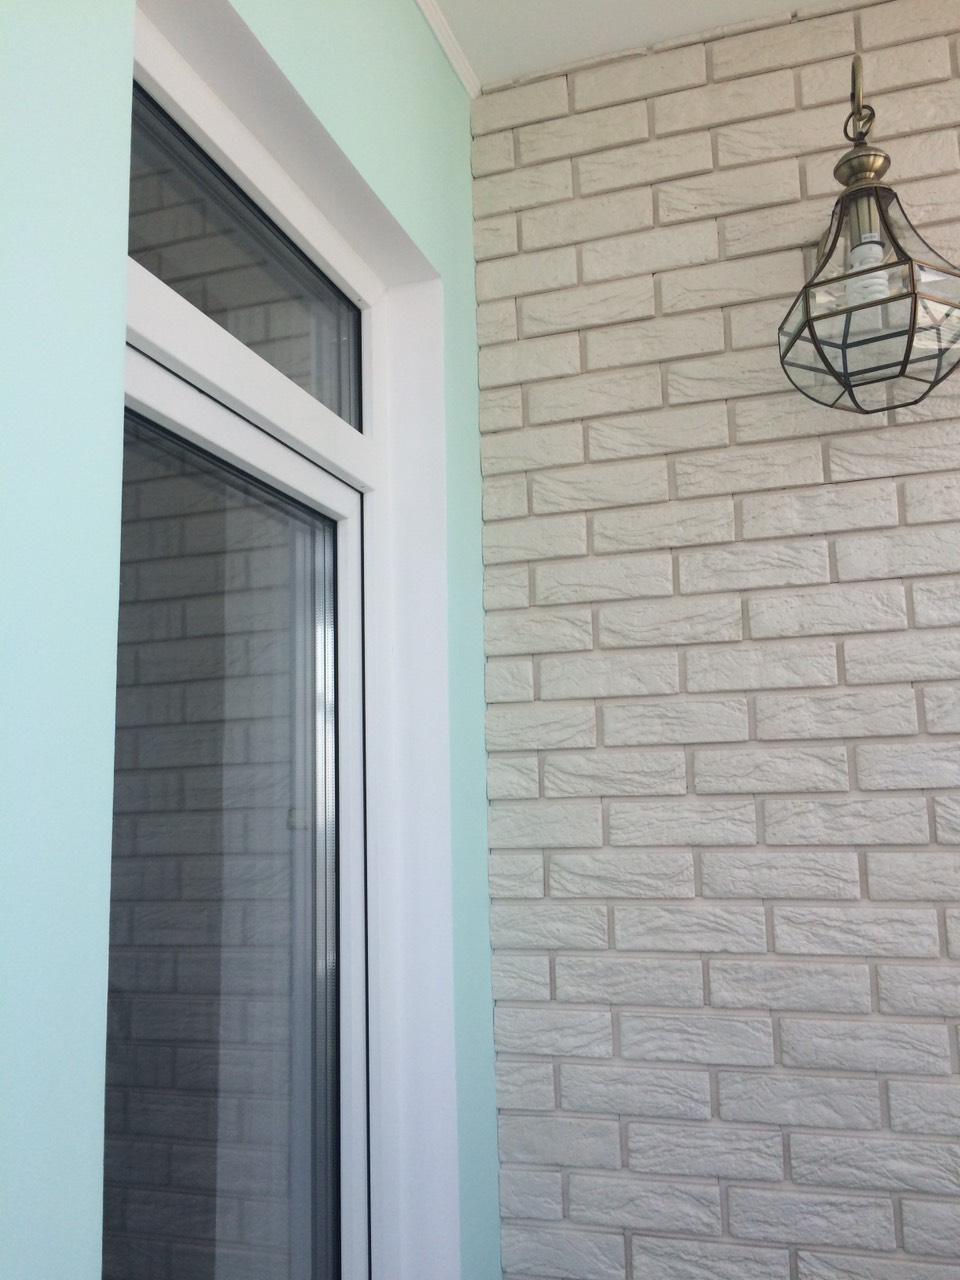 Фото Укладка гипсовой плитки, шпаклёвка, покраска стен балкона, откосы.